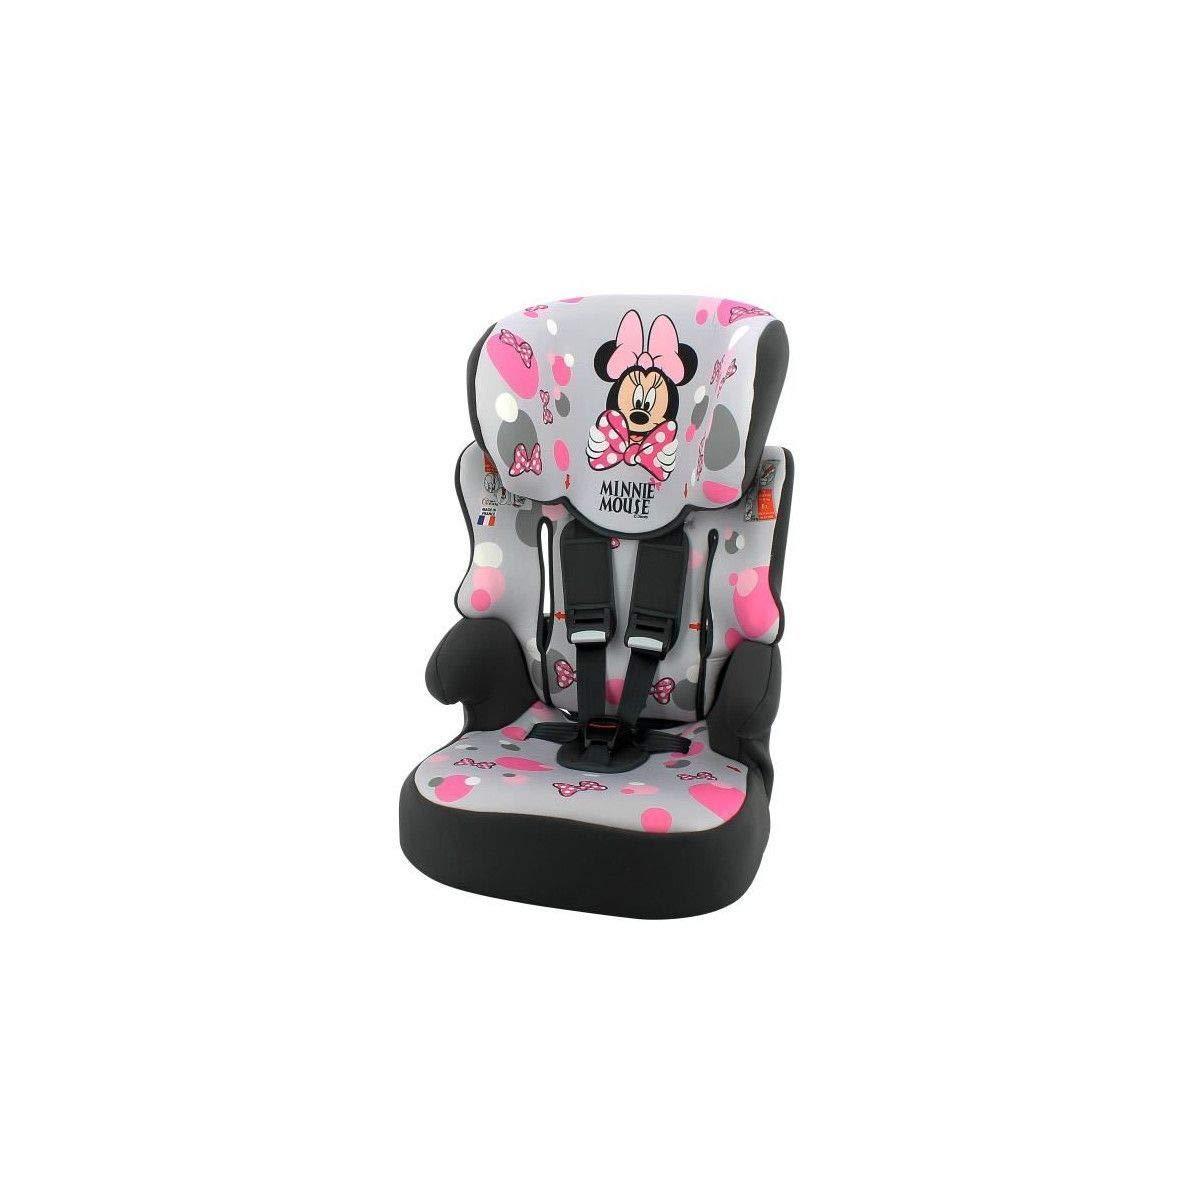 Minnie Siege Auto beline Groupe 1-2-3 Disney Framboise